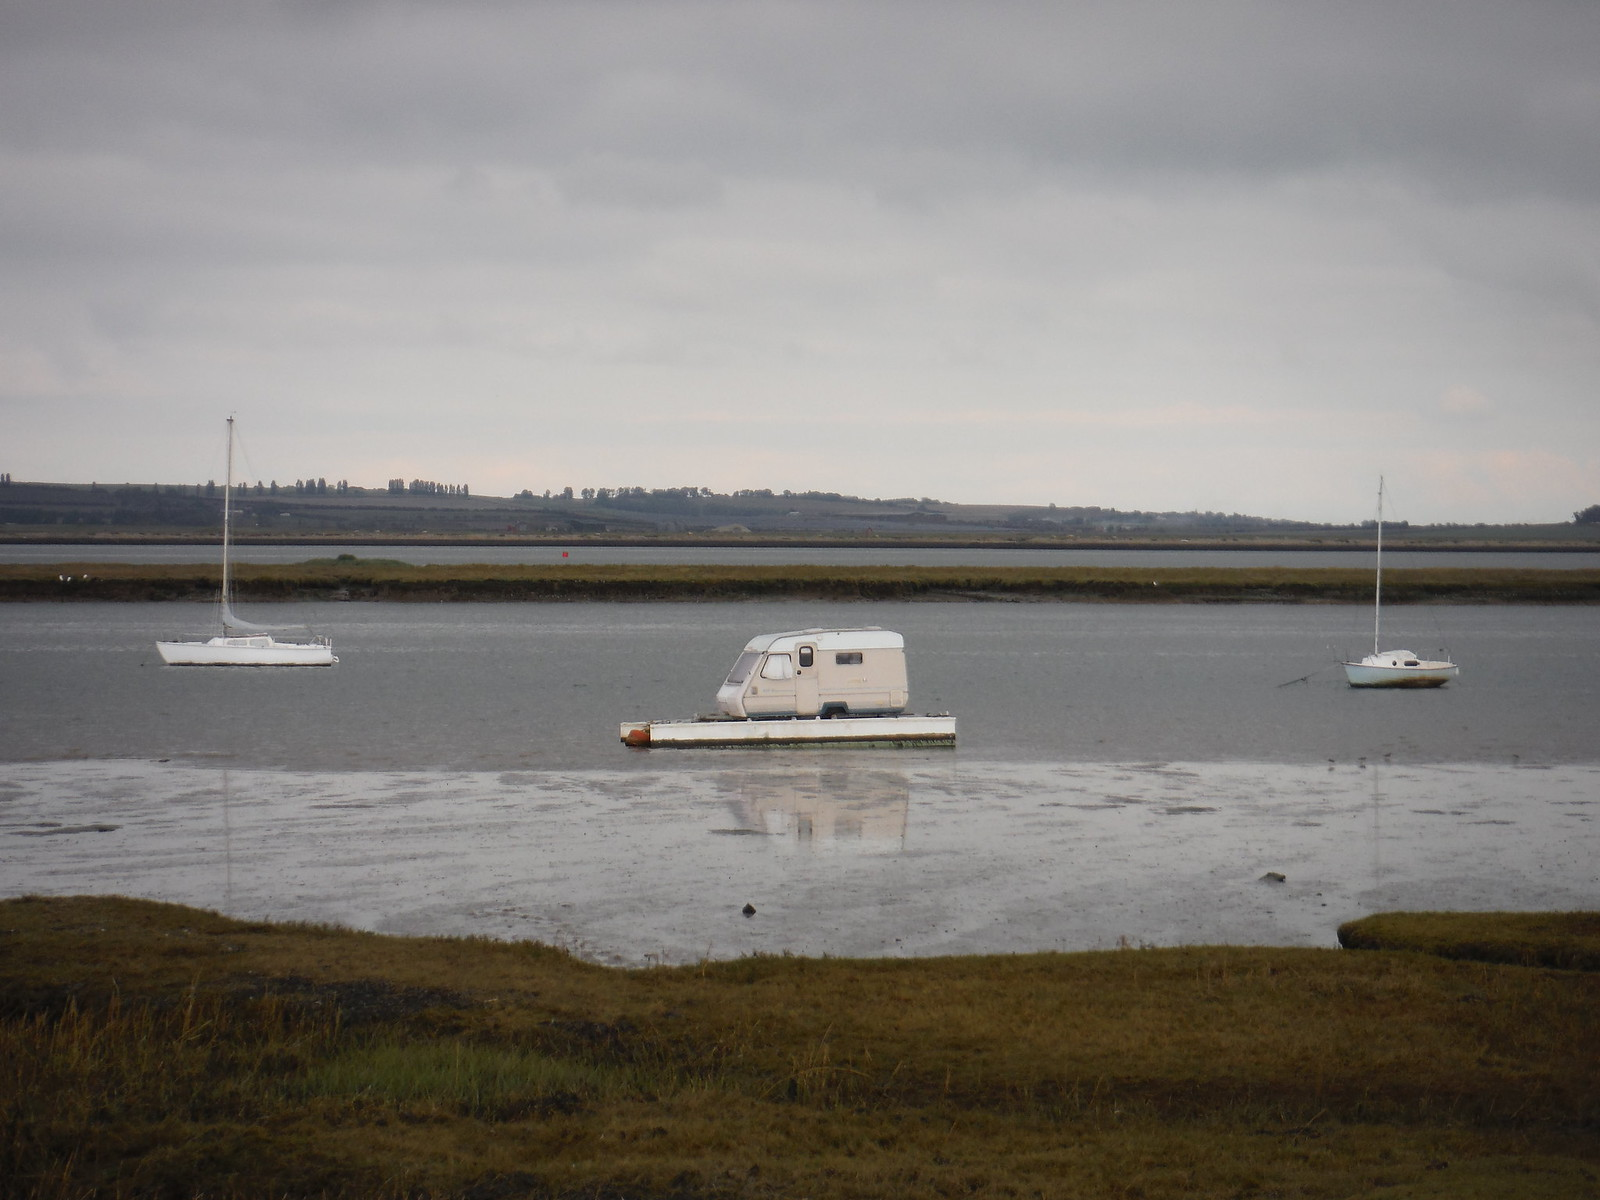 Anchored in the South Deep SWC Walk 299 - Teynham to Faversham